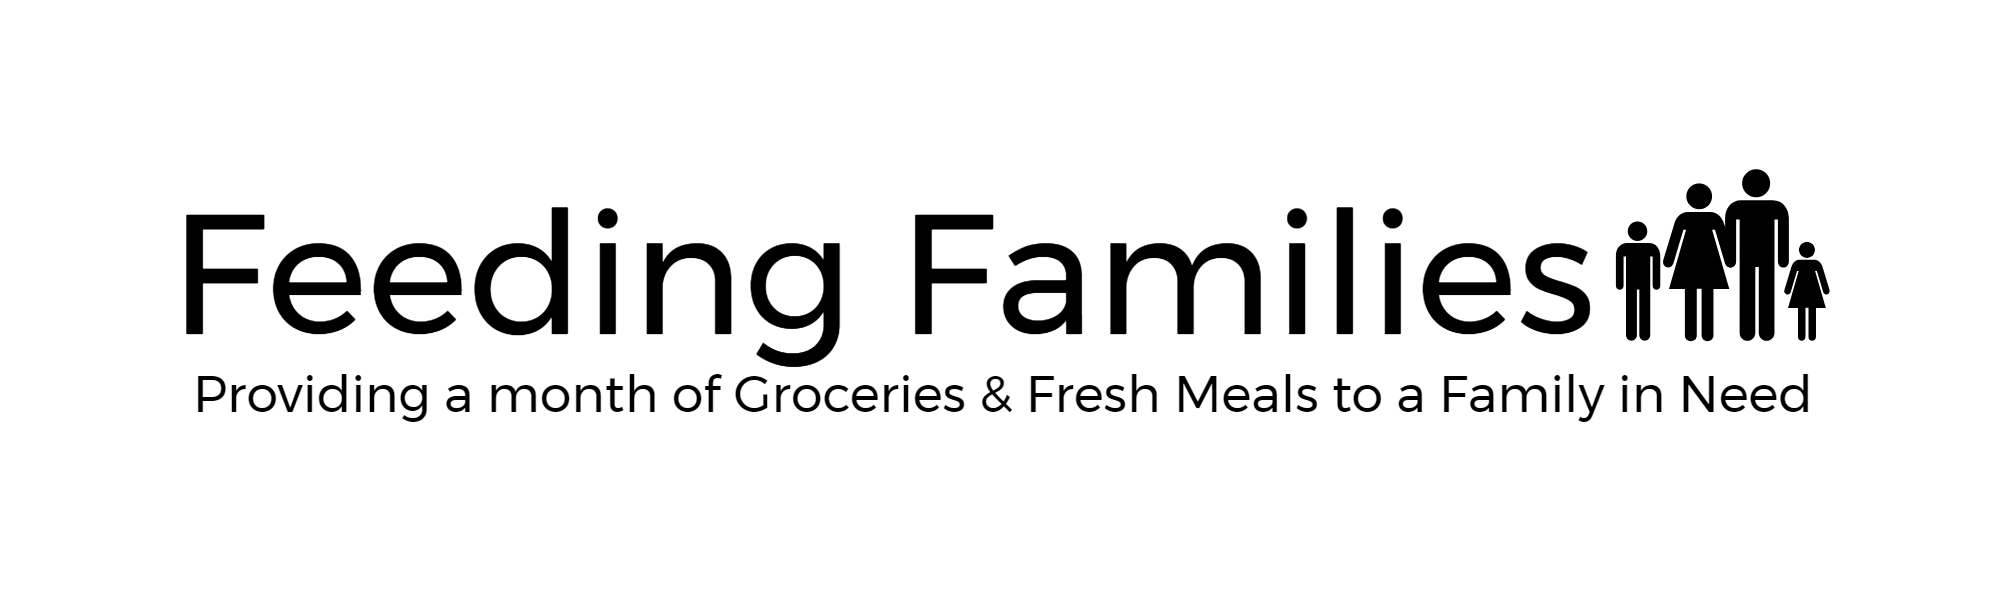 Feeding Families-logo-black.png